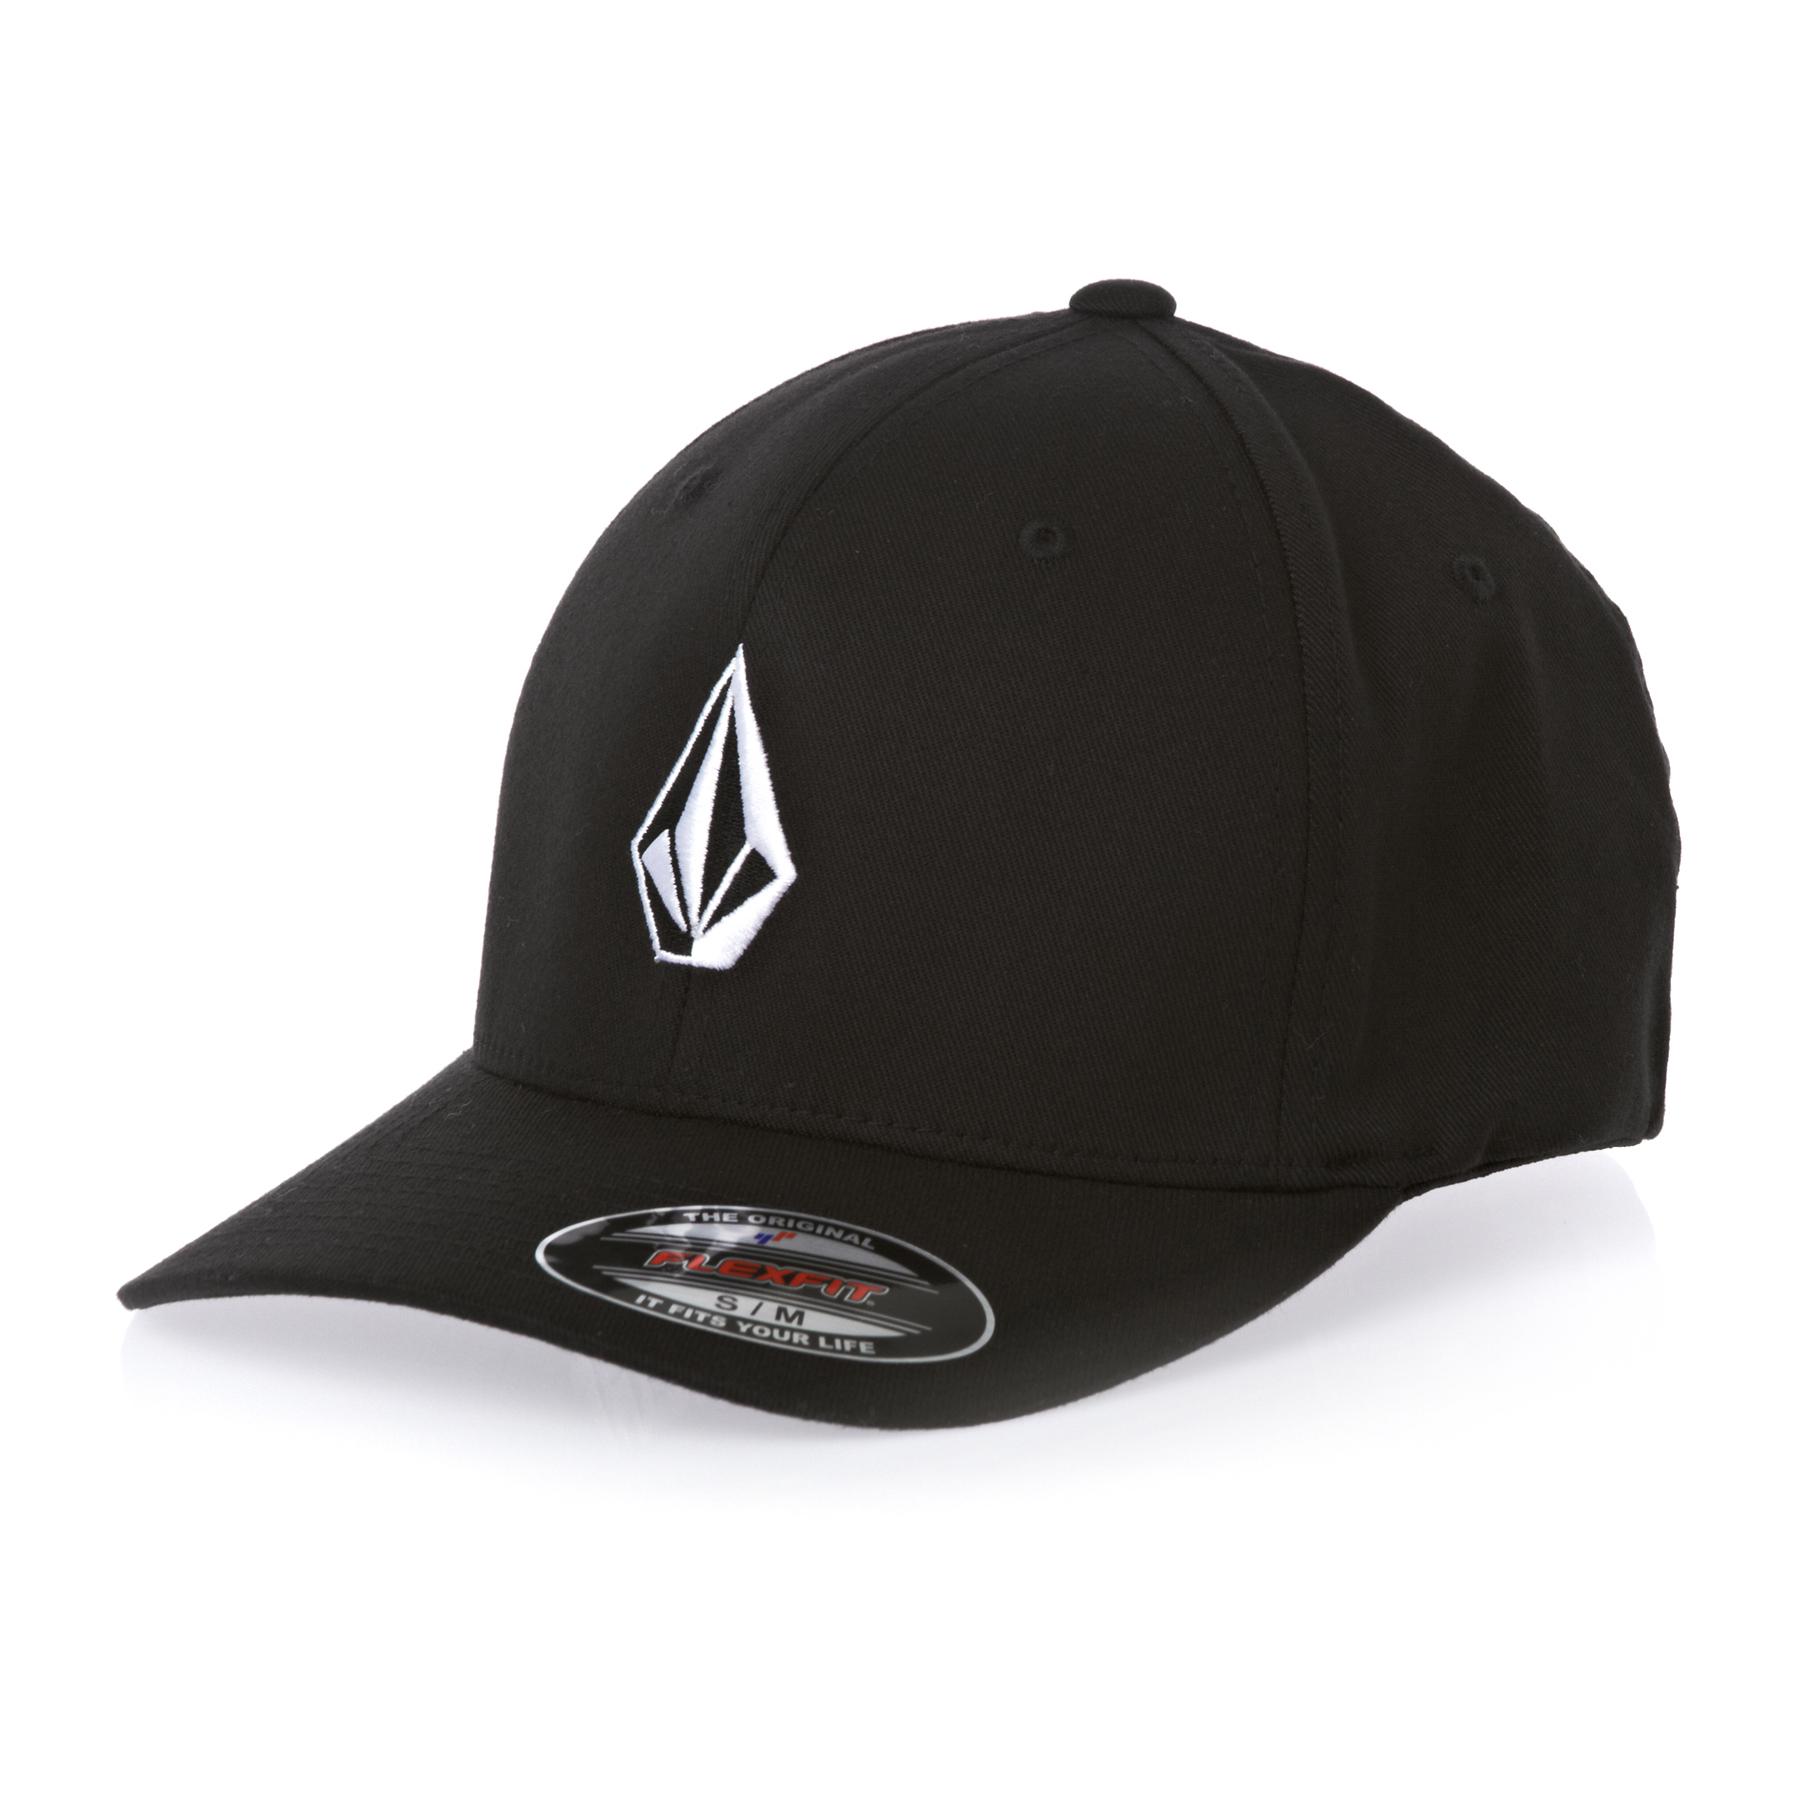 Volcom Full Stone Xfit Mens Cap - Black